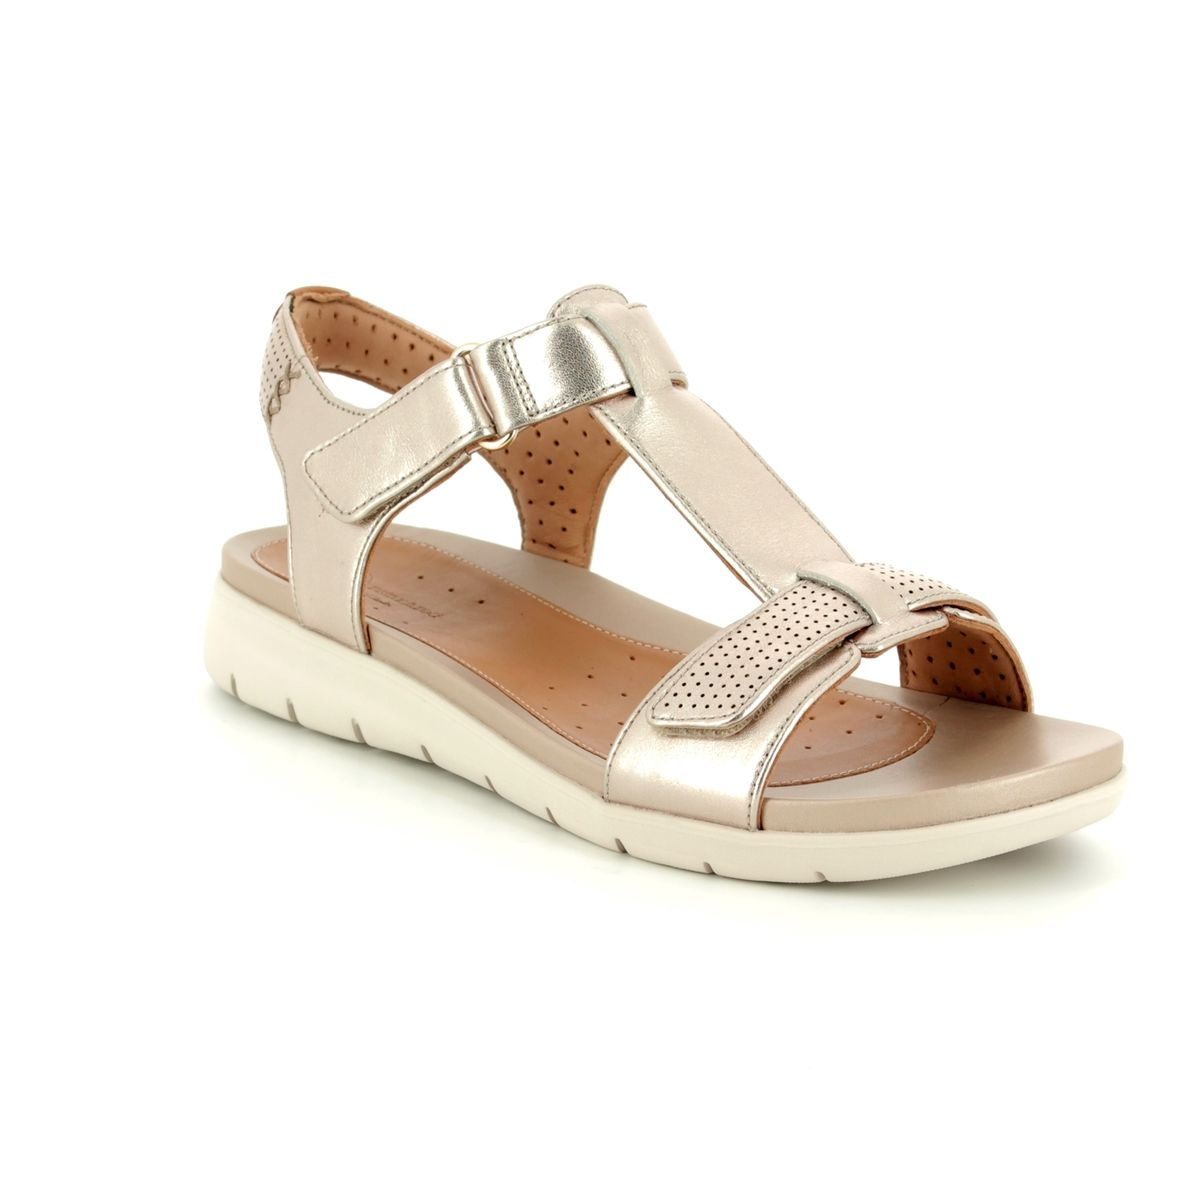 a6a1ef7ff07 Clarks Sandals - Gold - 3330 74D UN HAYWOOD